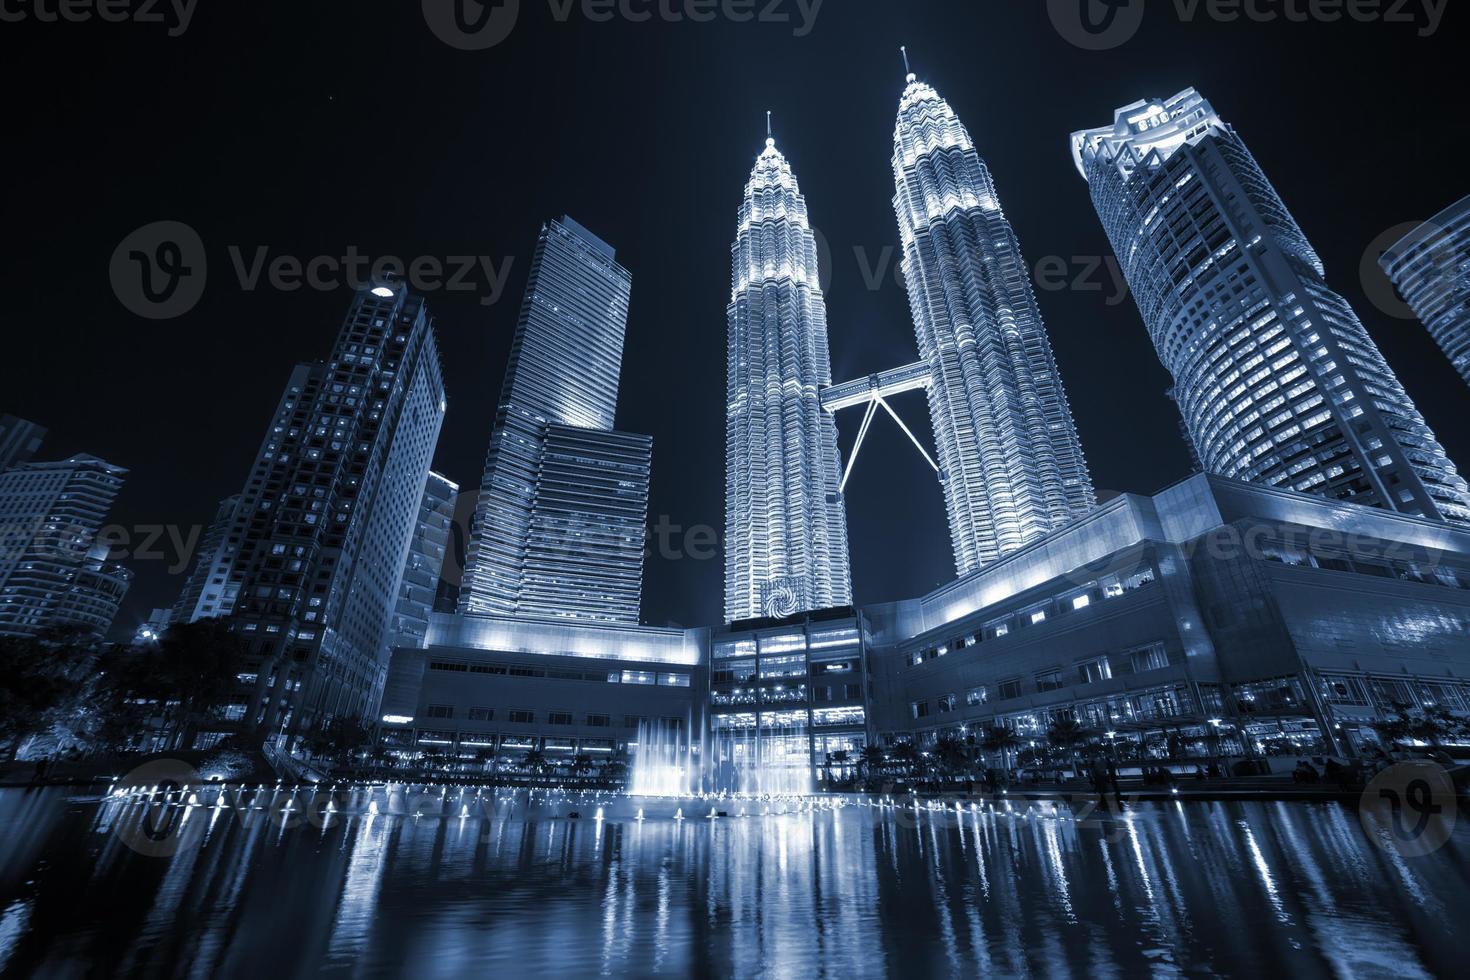 Petronas towers in Kuala Lumpur photo